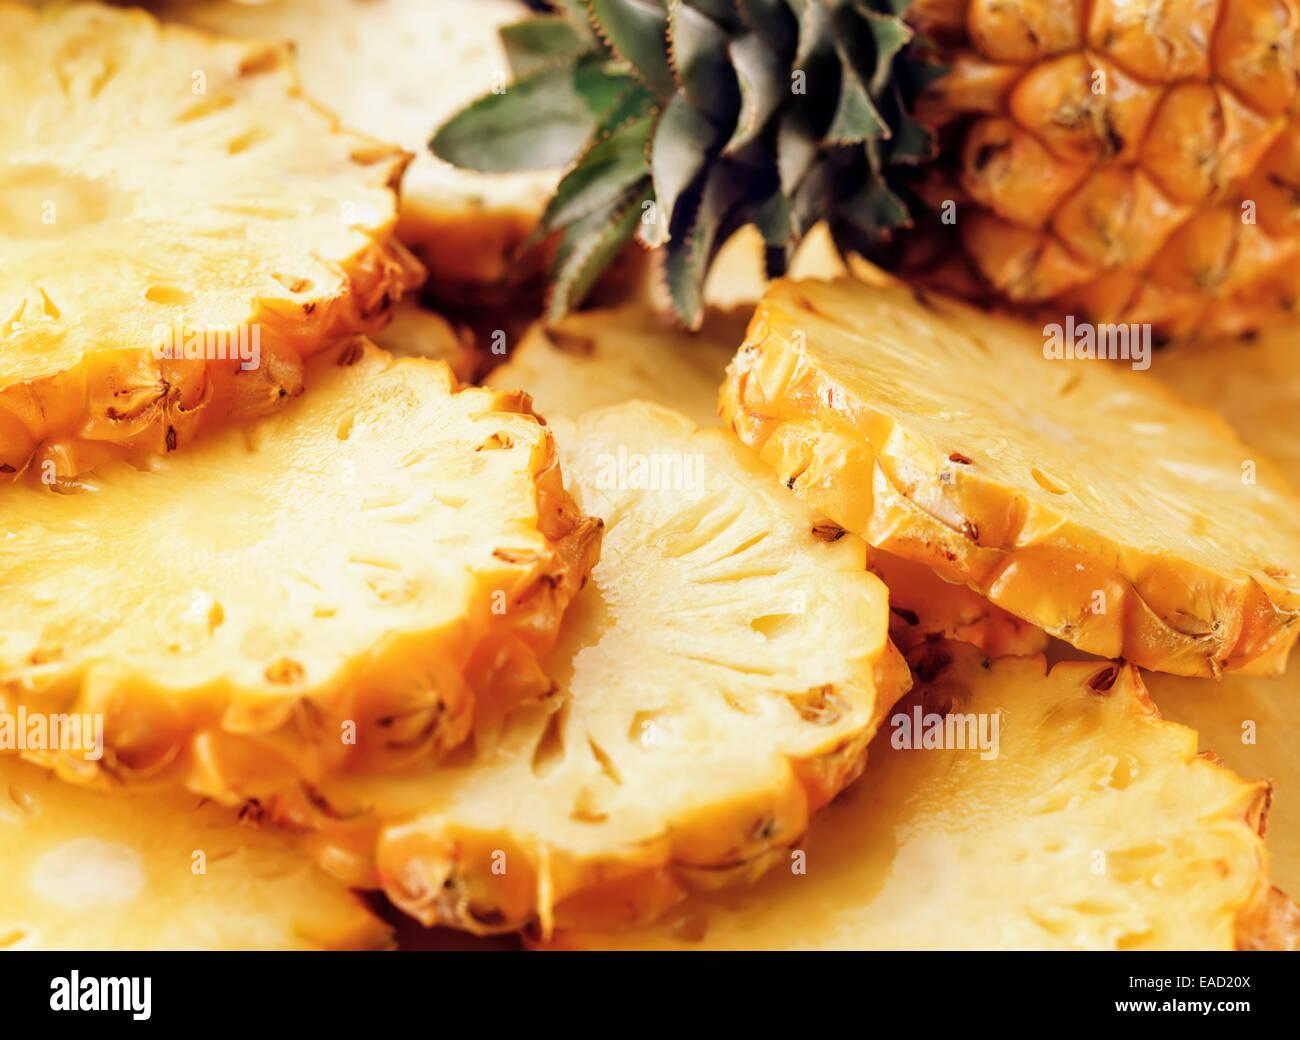 Pineapple, Ananas comosus, Yellow subject. - Stock Image